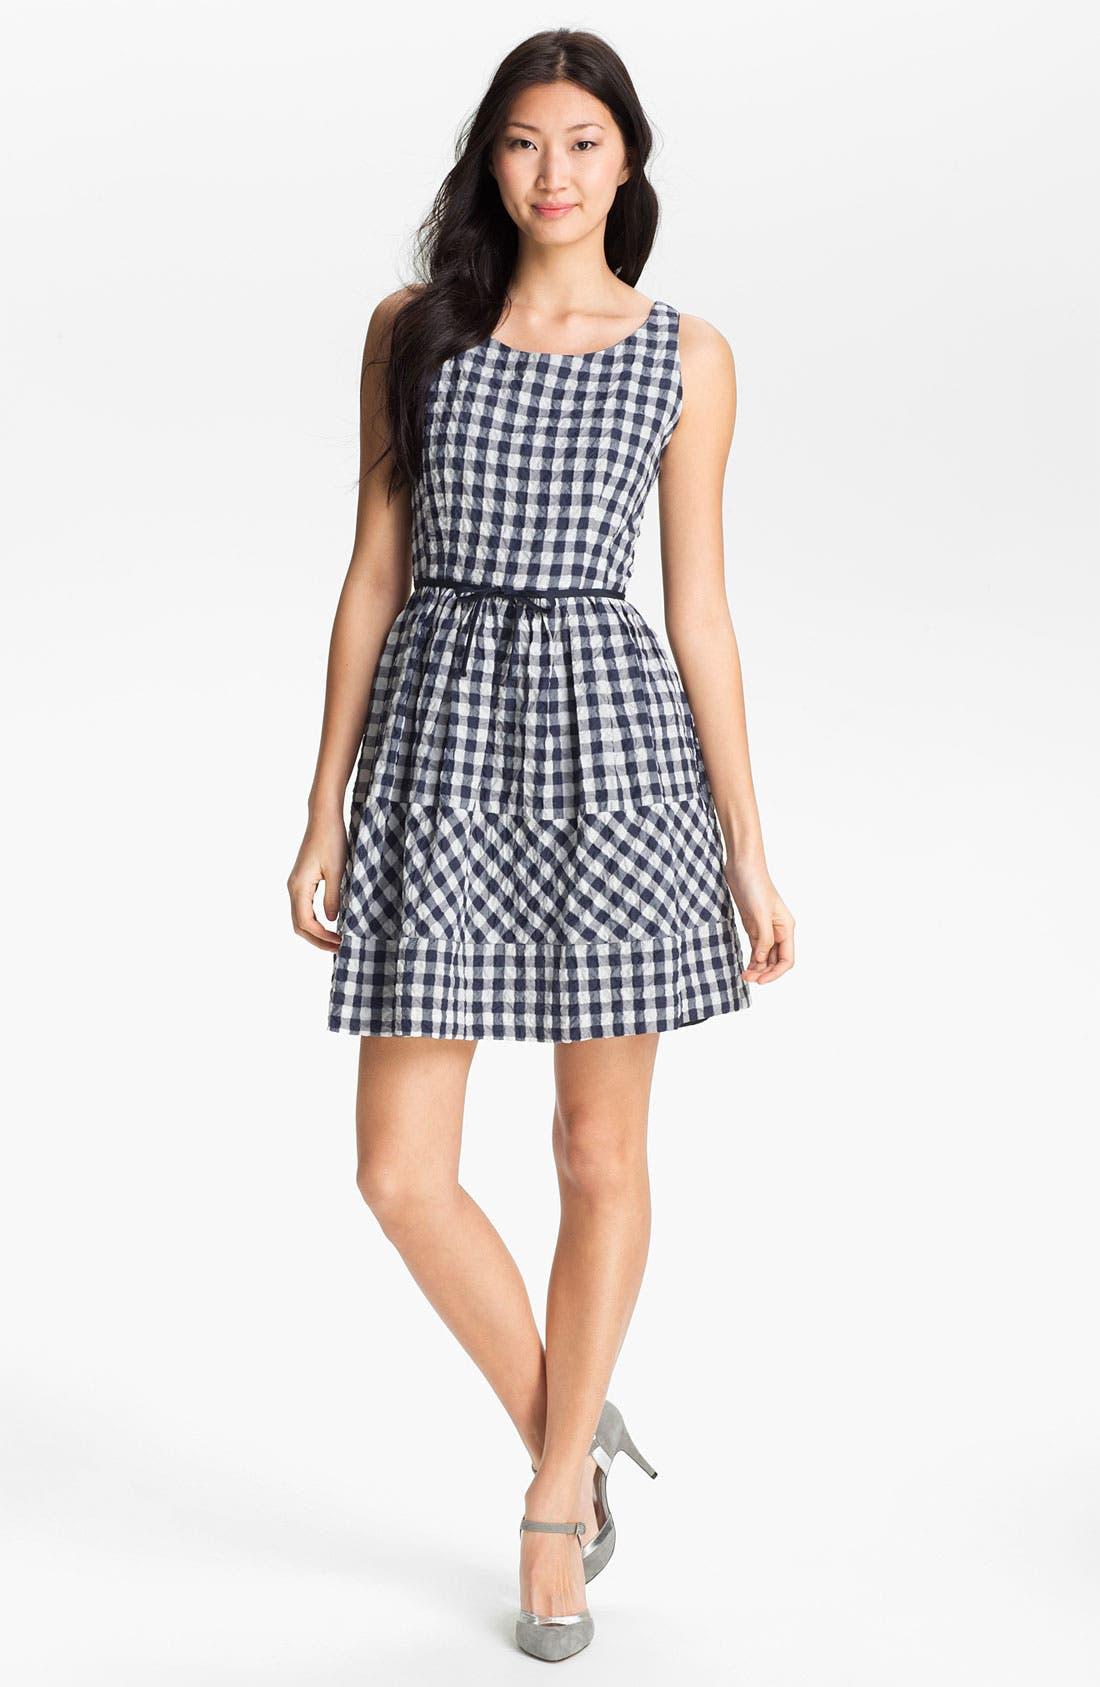 Main Image - Taylor Dresses Gingham Fit & Flare Dress